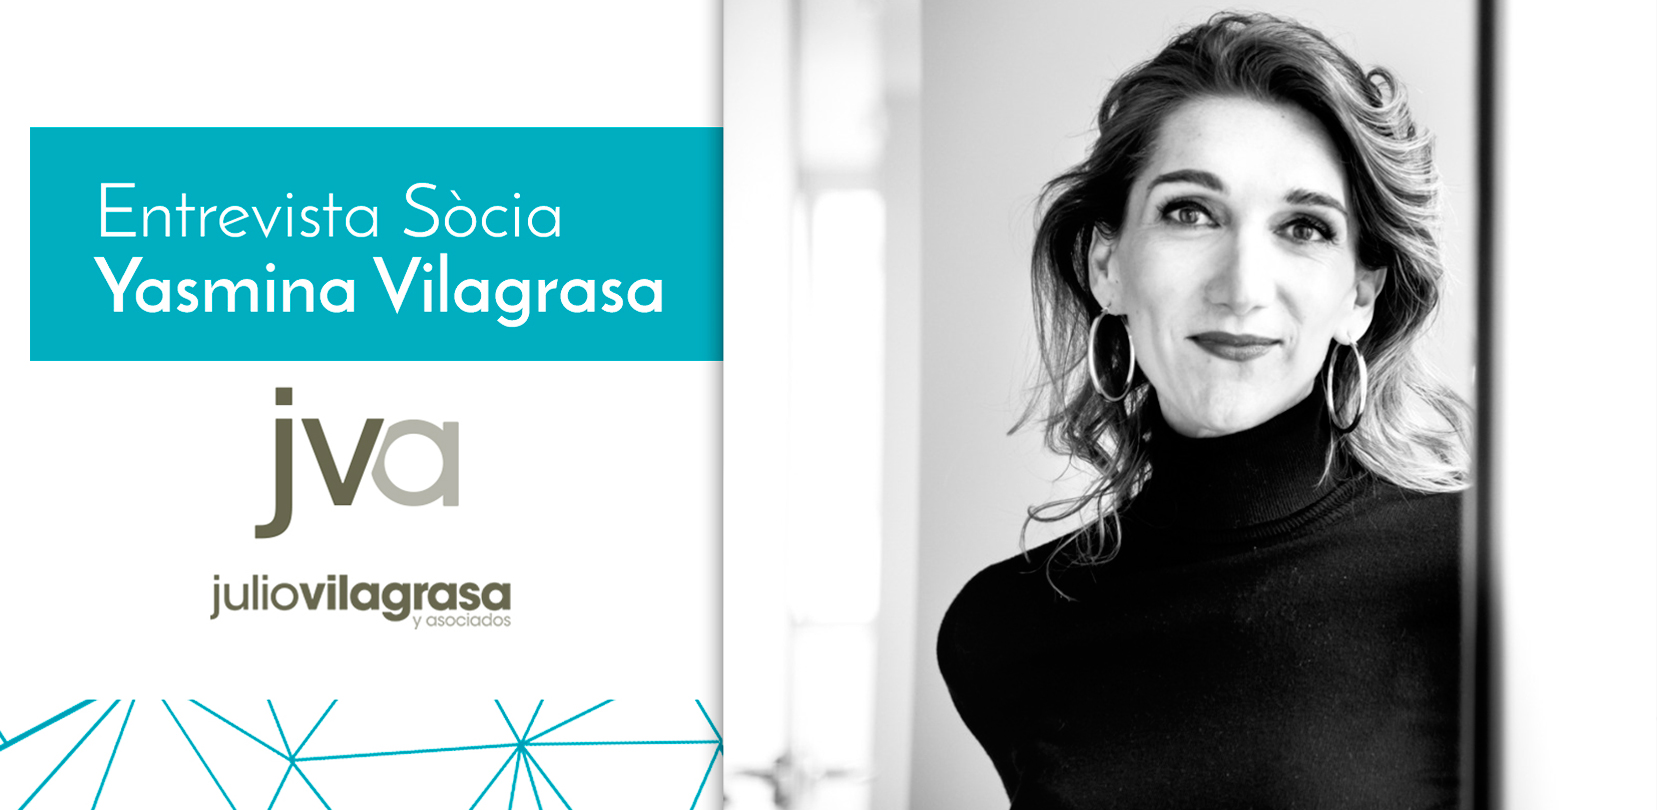 Ap! Lleida Entrevista Socia Yasmina Vilagrasa Horitzontal